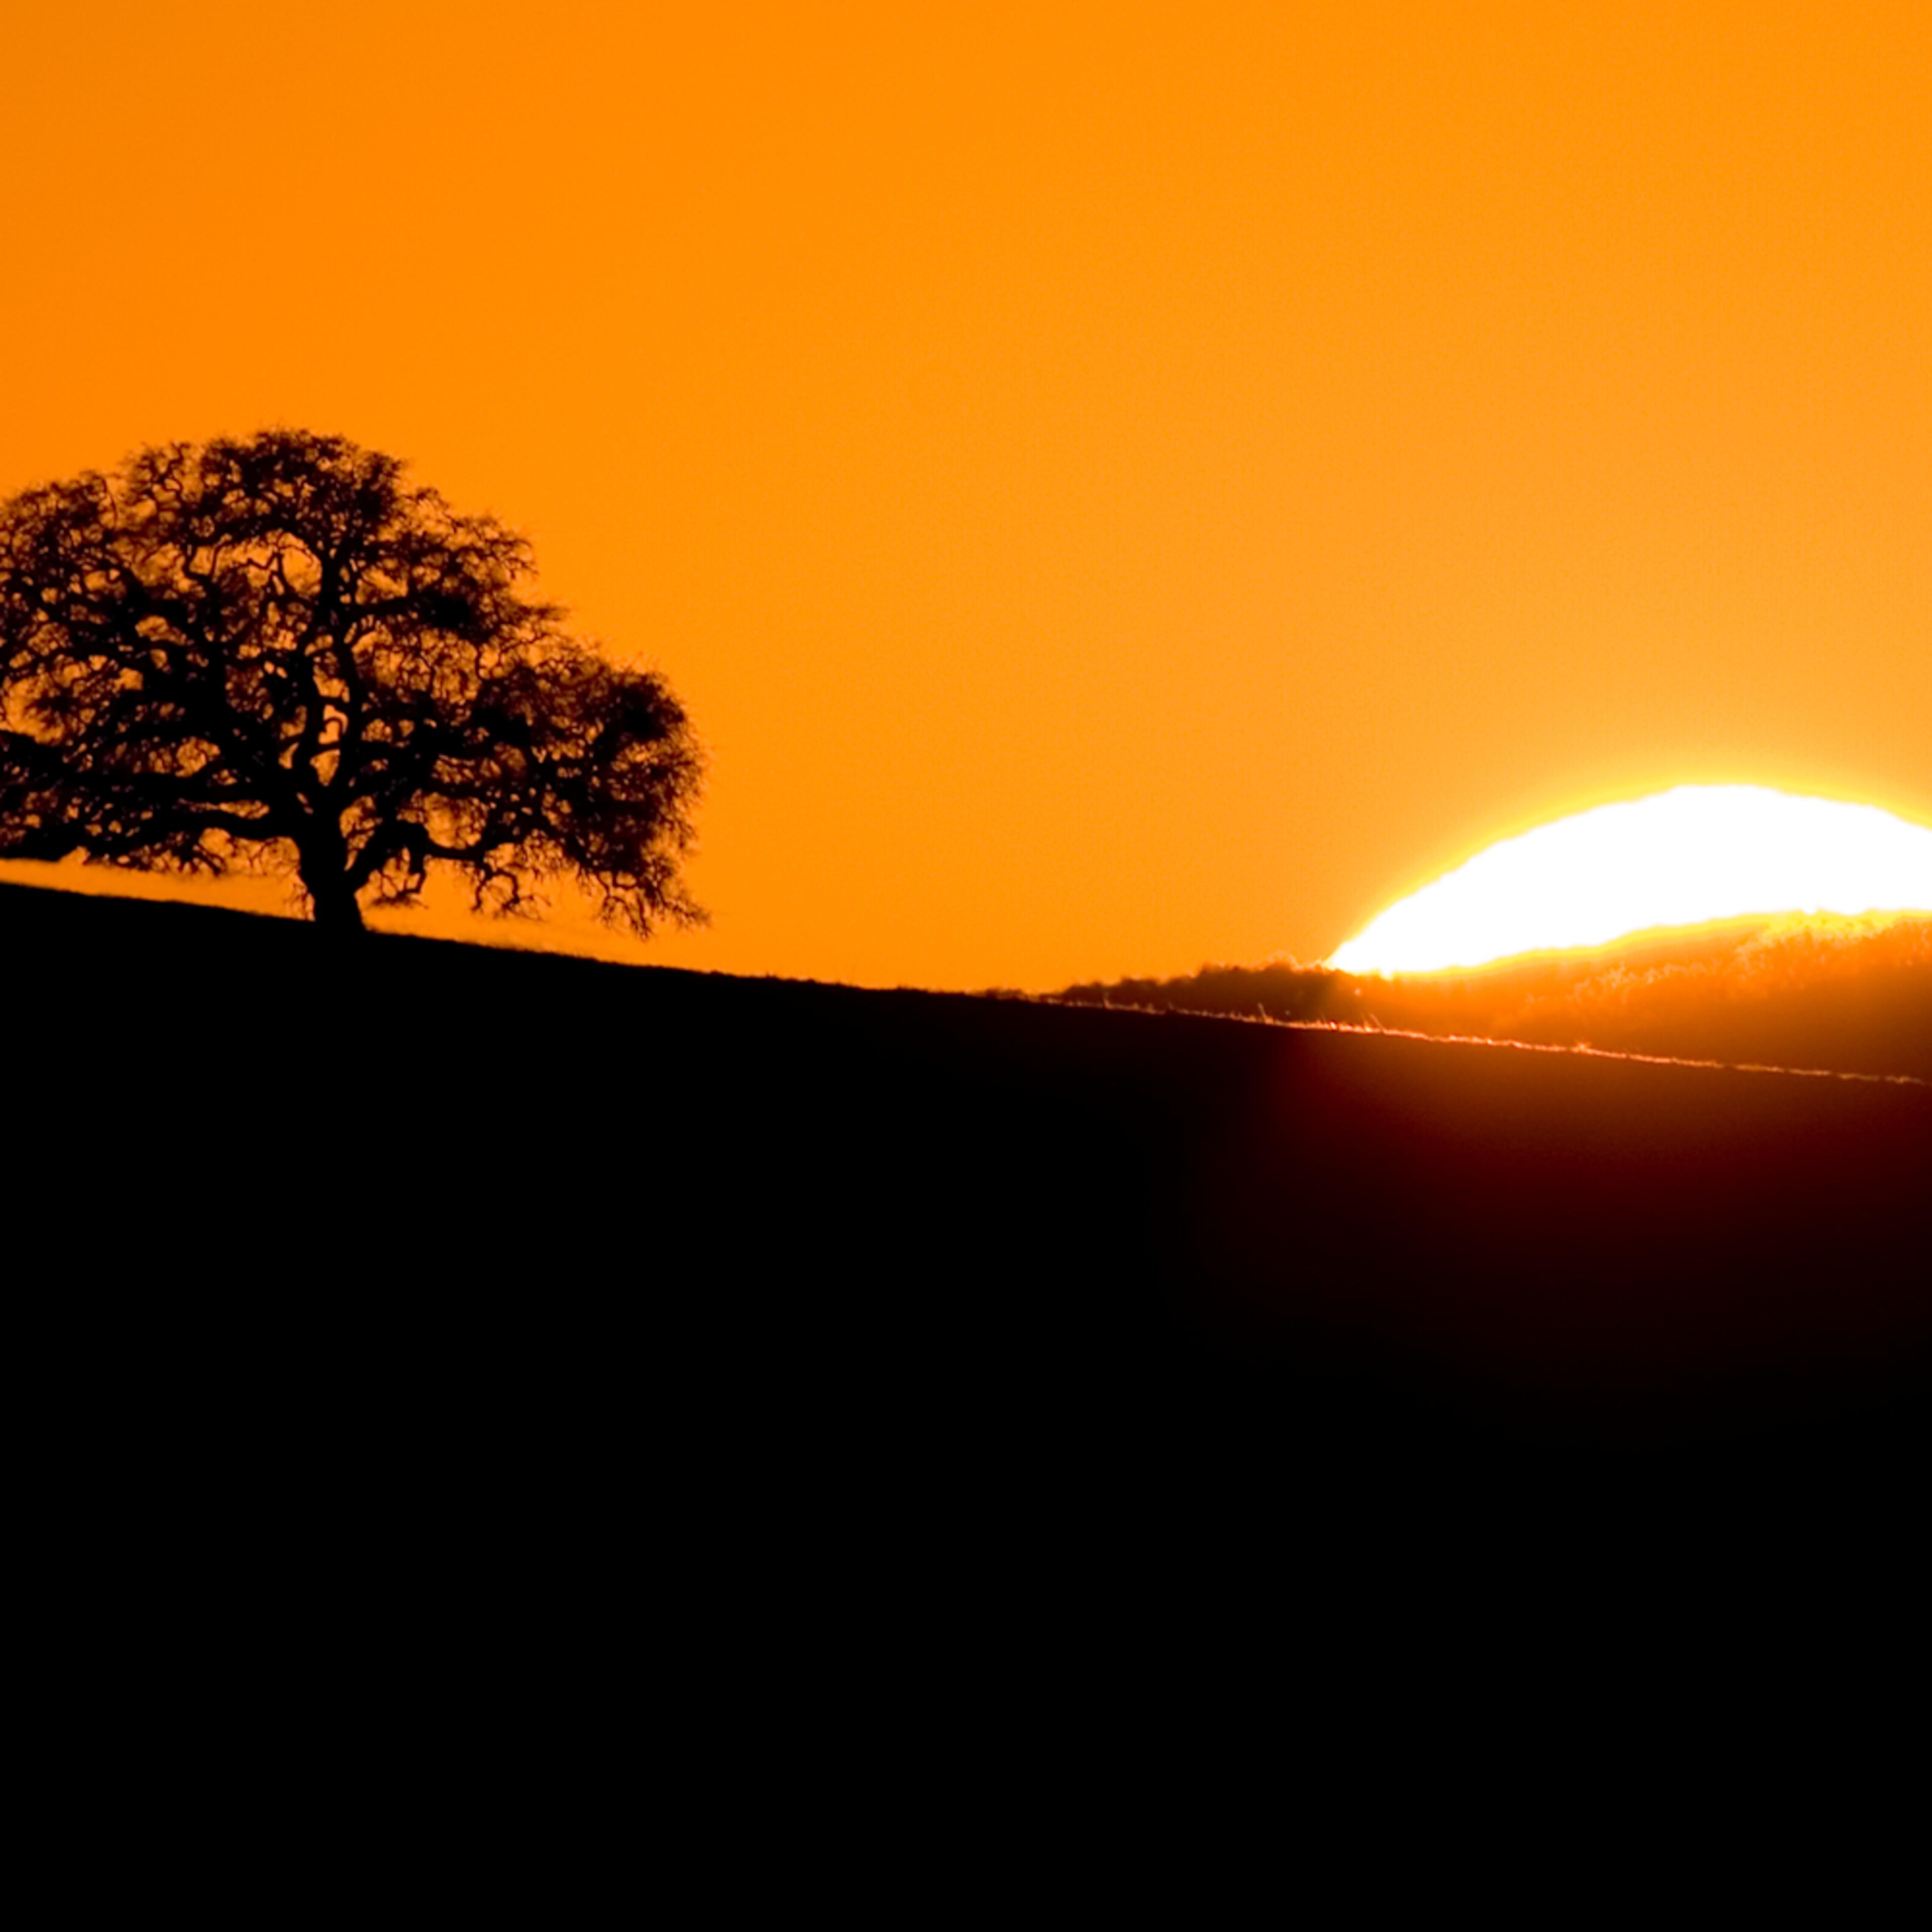 Sunset oak hjg2jk